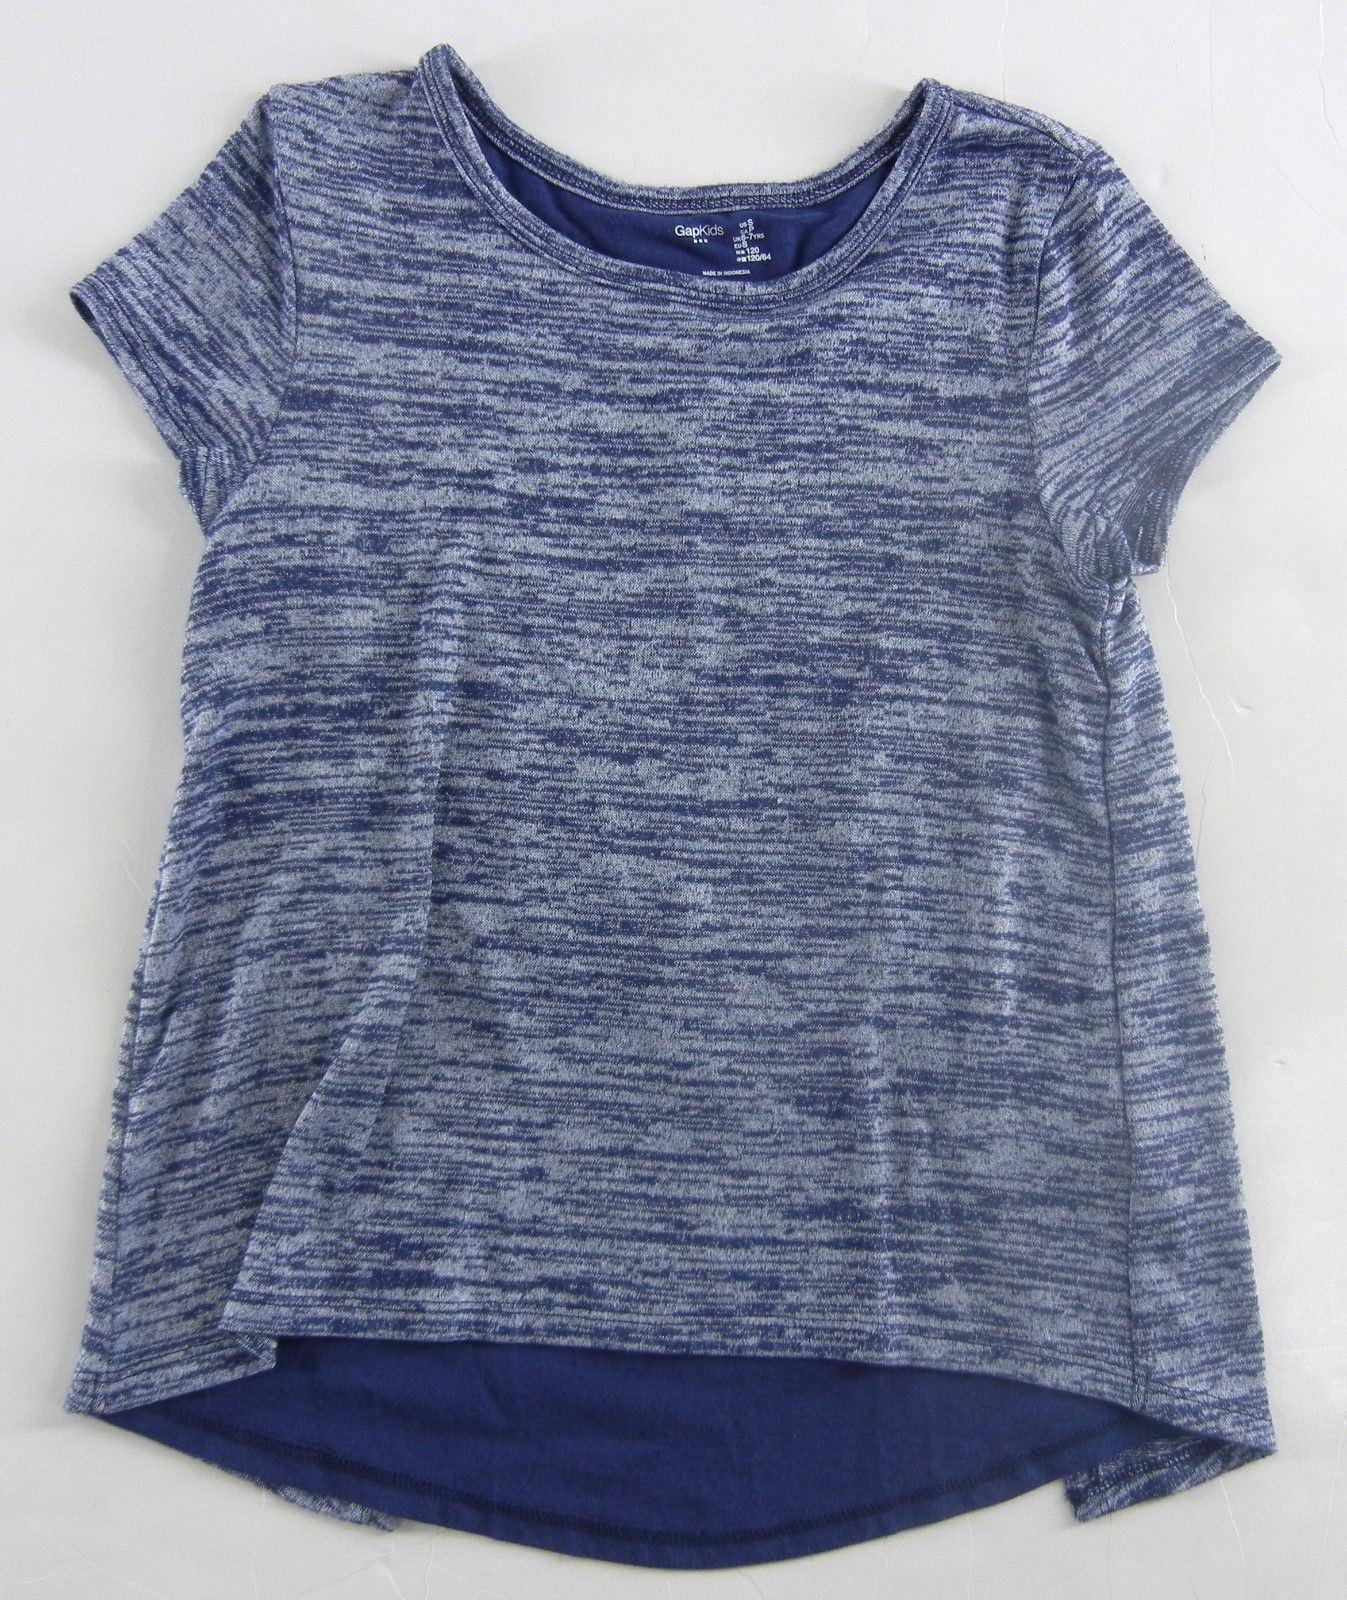 d37e7be5e5fb3b GAP KIDS Girl's Nurian Envelope Dutch Blue Knit Shirt Top S 6 7 yrs Split  Back